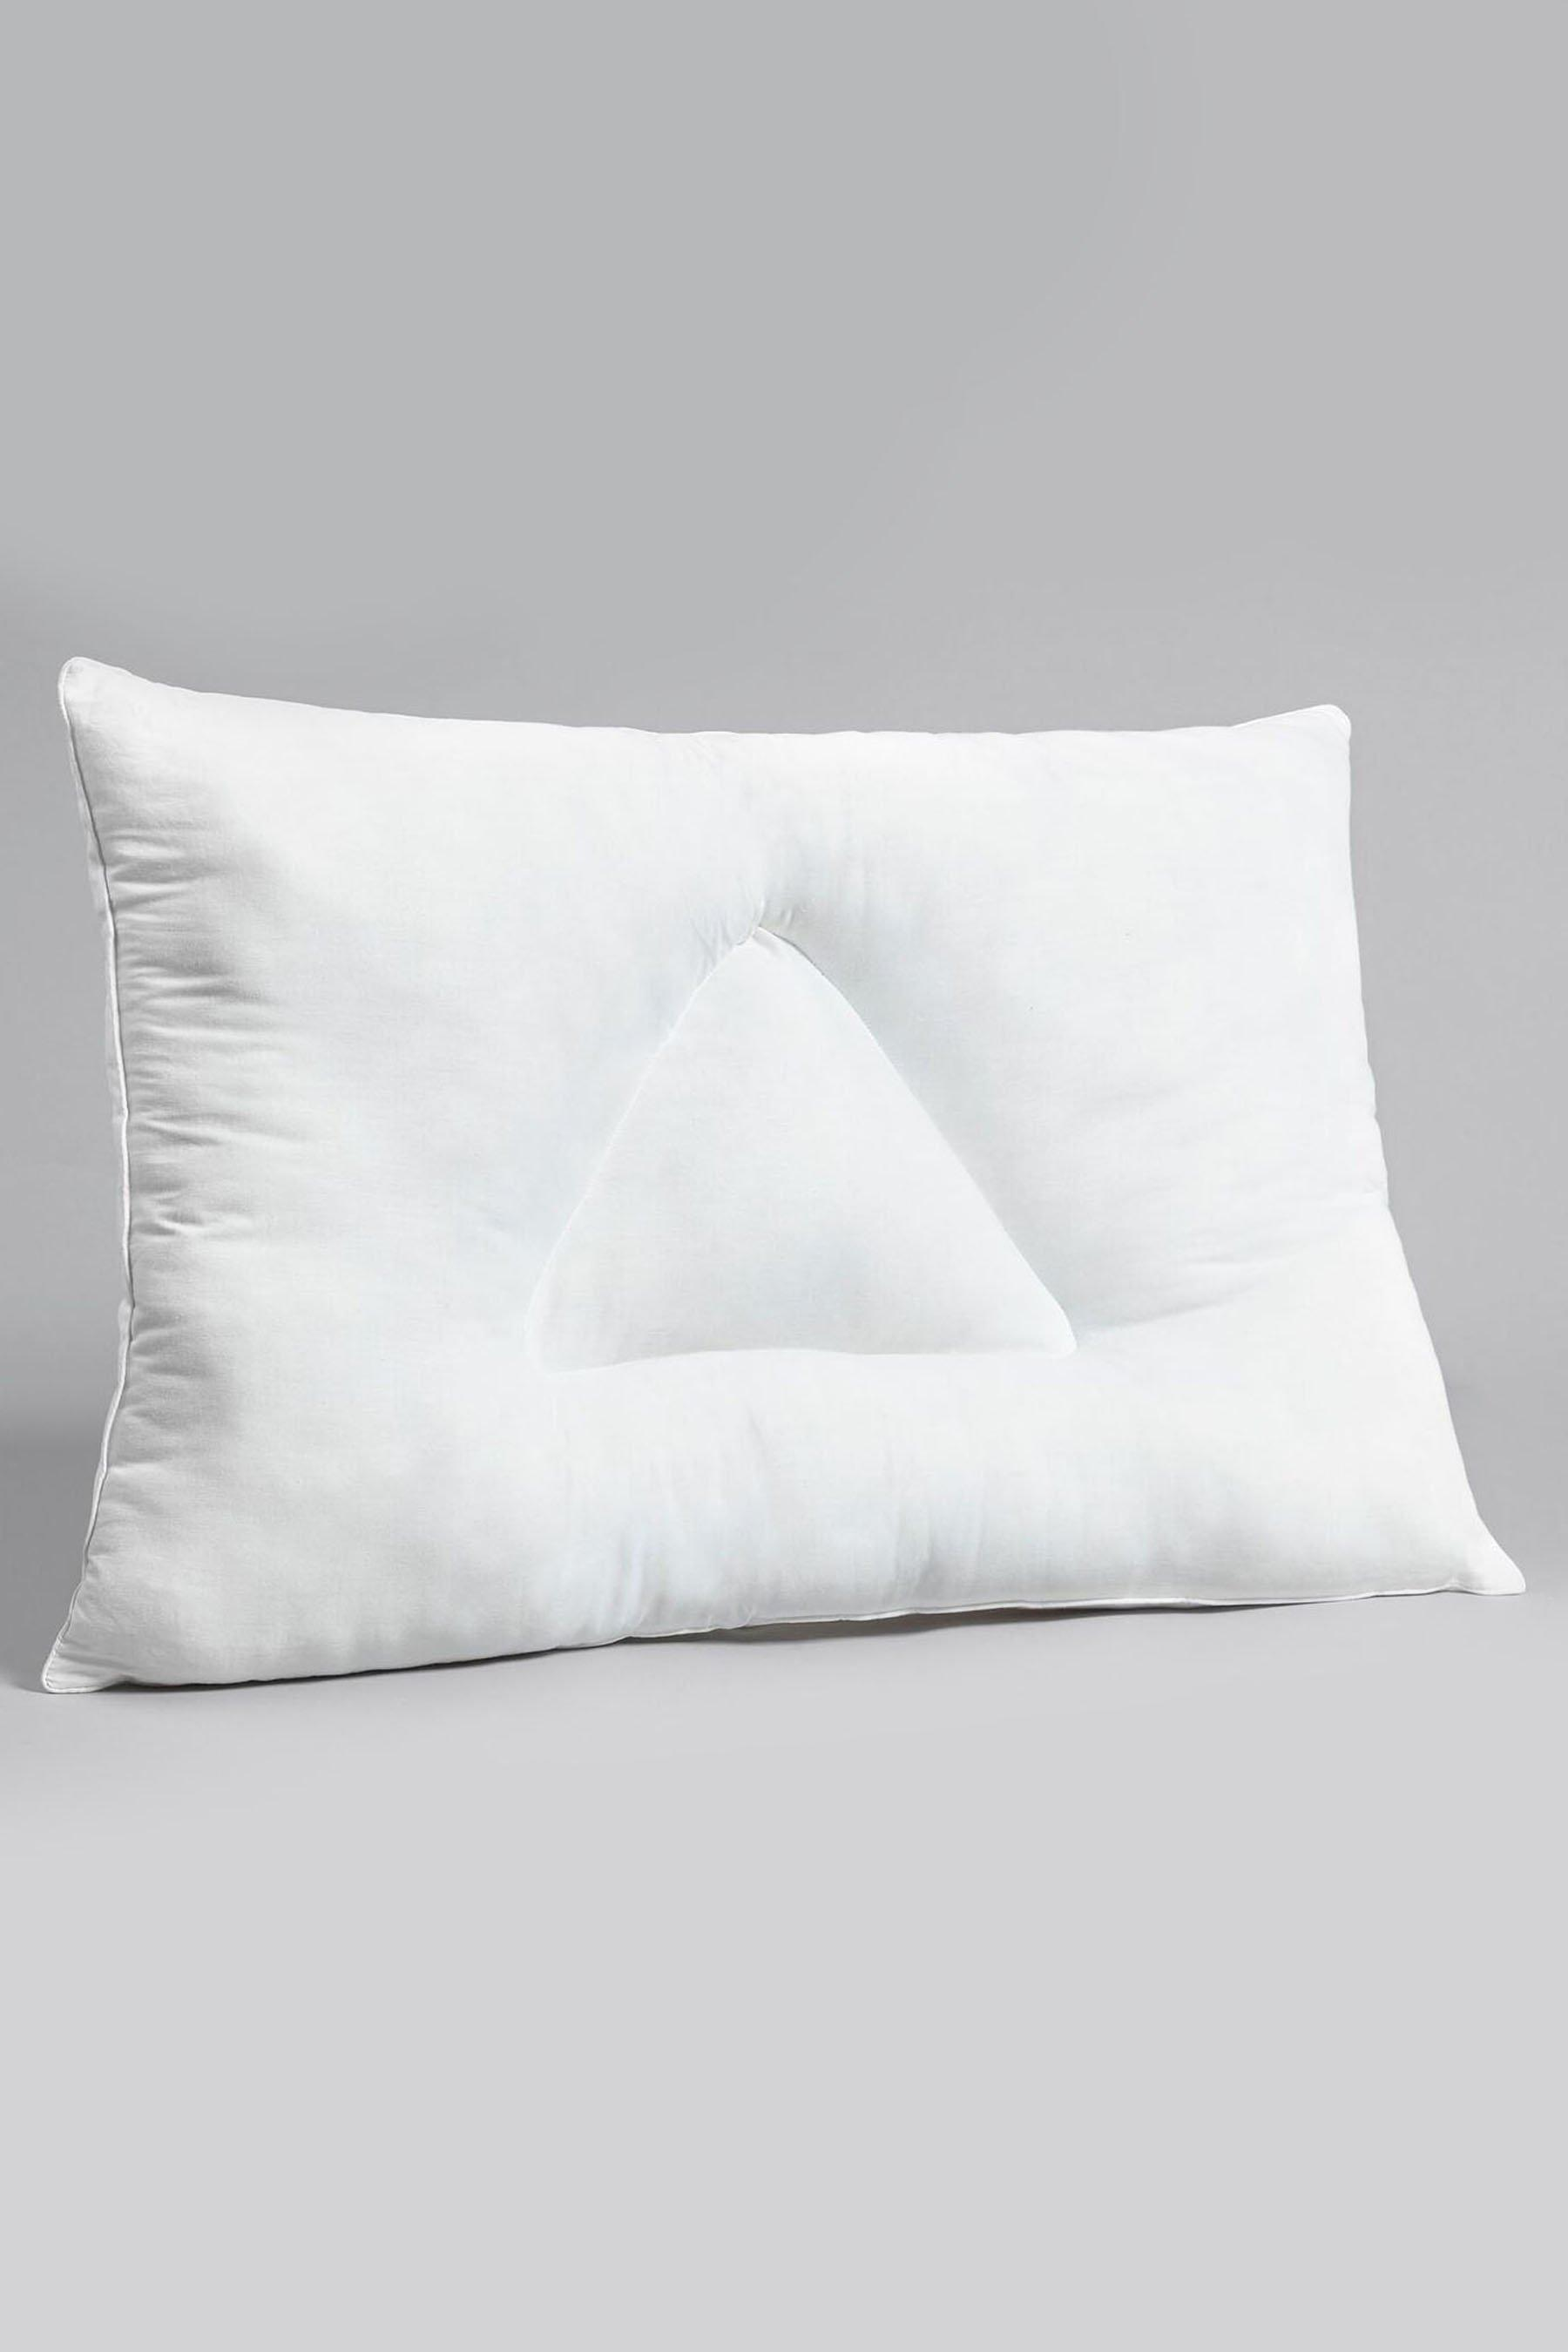 Dr Twiner Pyramid Pillow | Studio